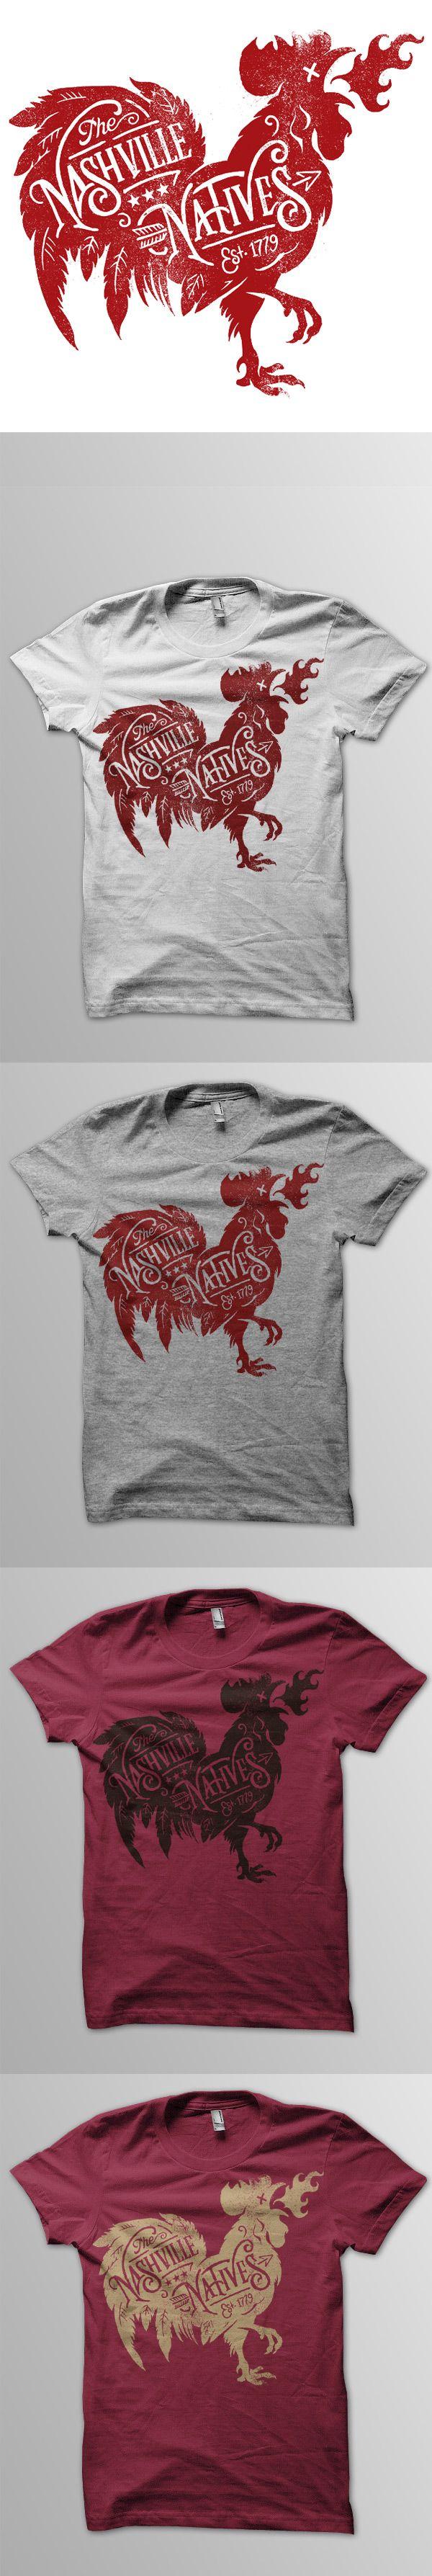 T shirt design app for ipad - Nashville Natives Tees Dribbble Chicken Nashville Natives Shirts Illustration Tee Shirt Designstee